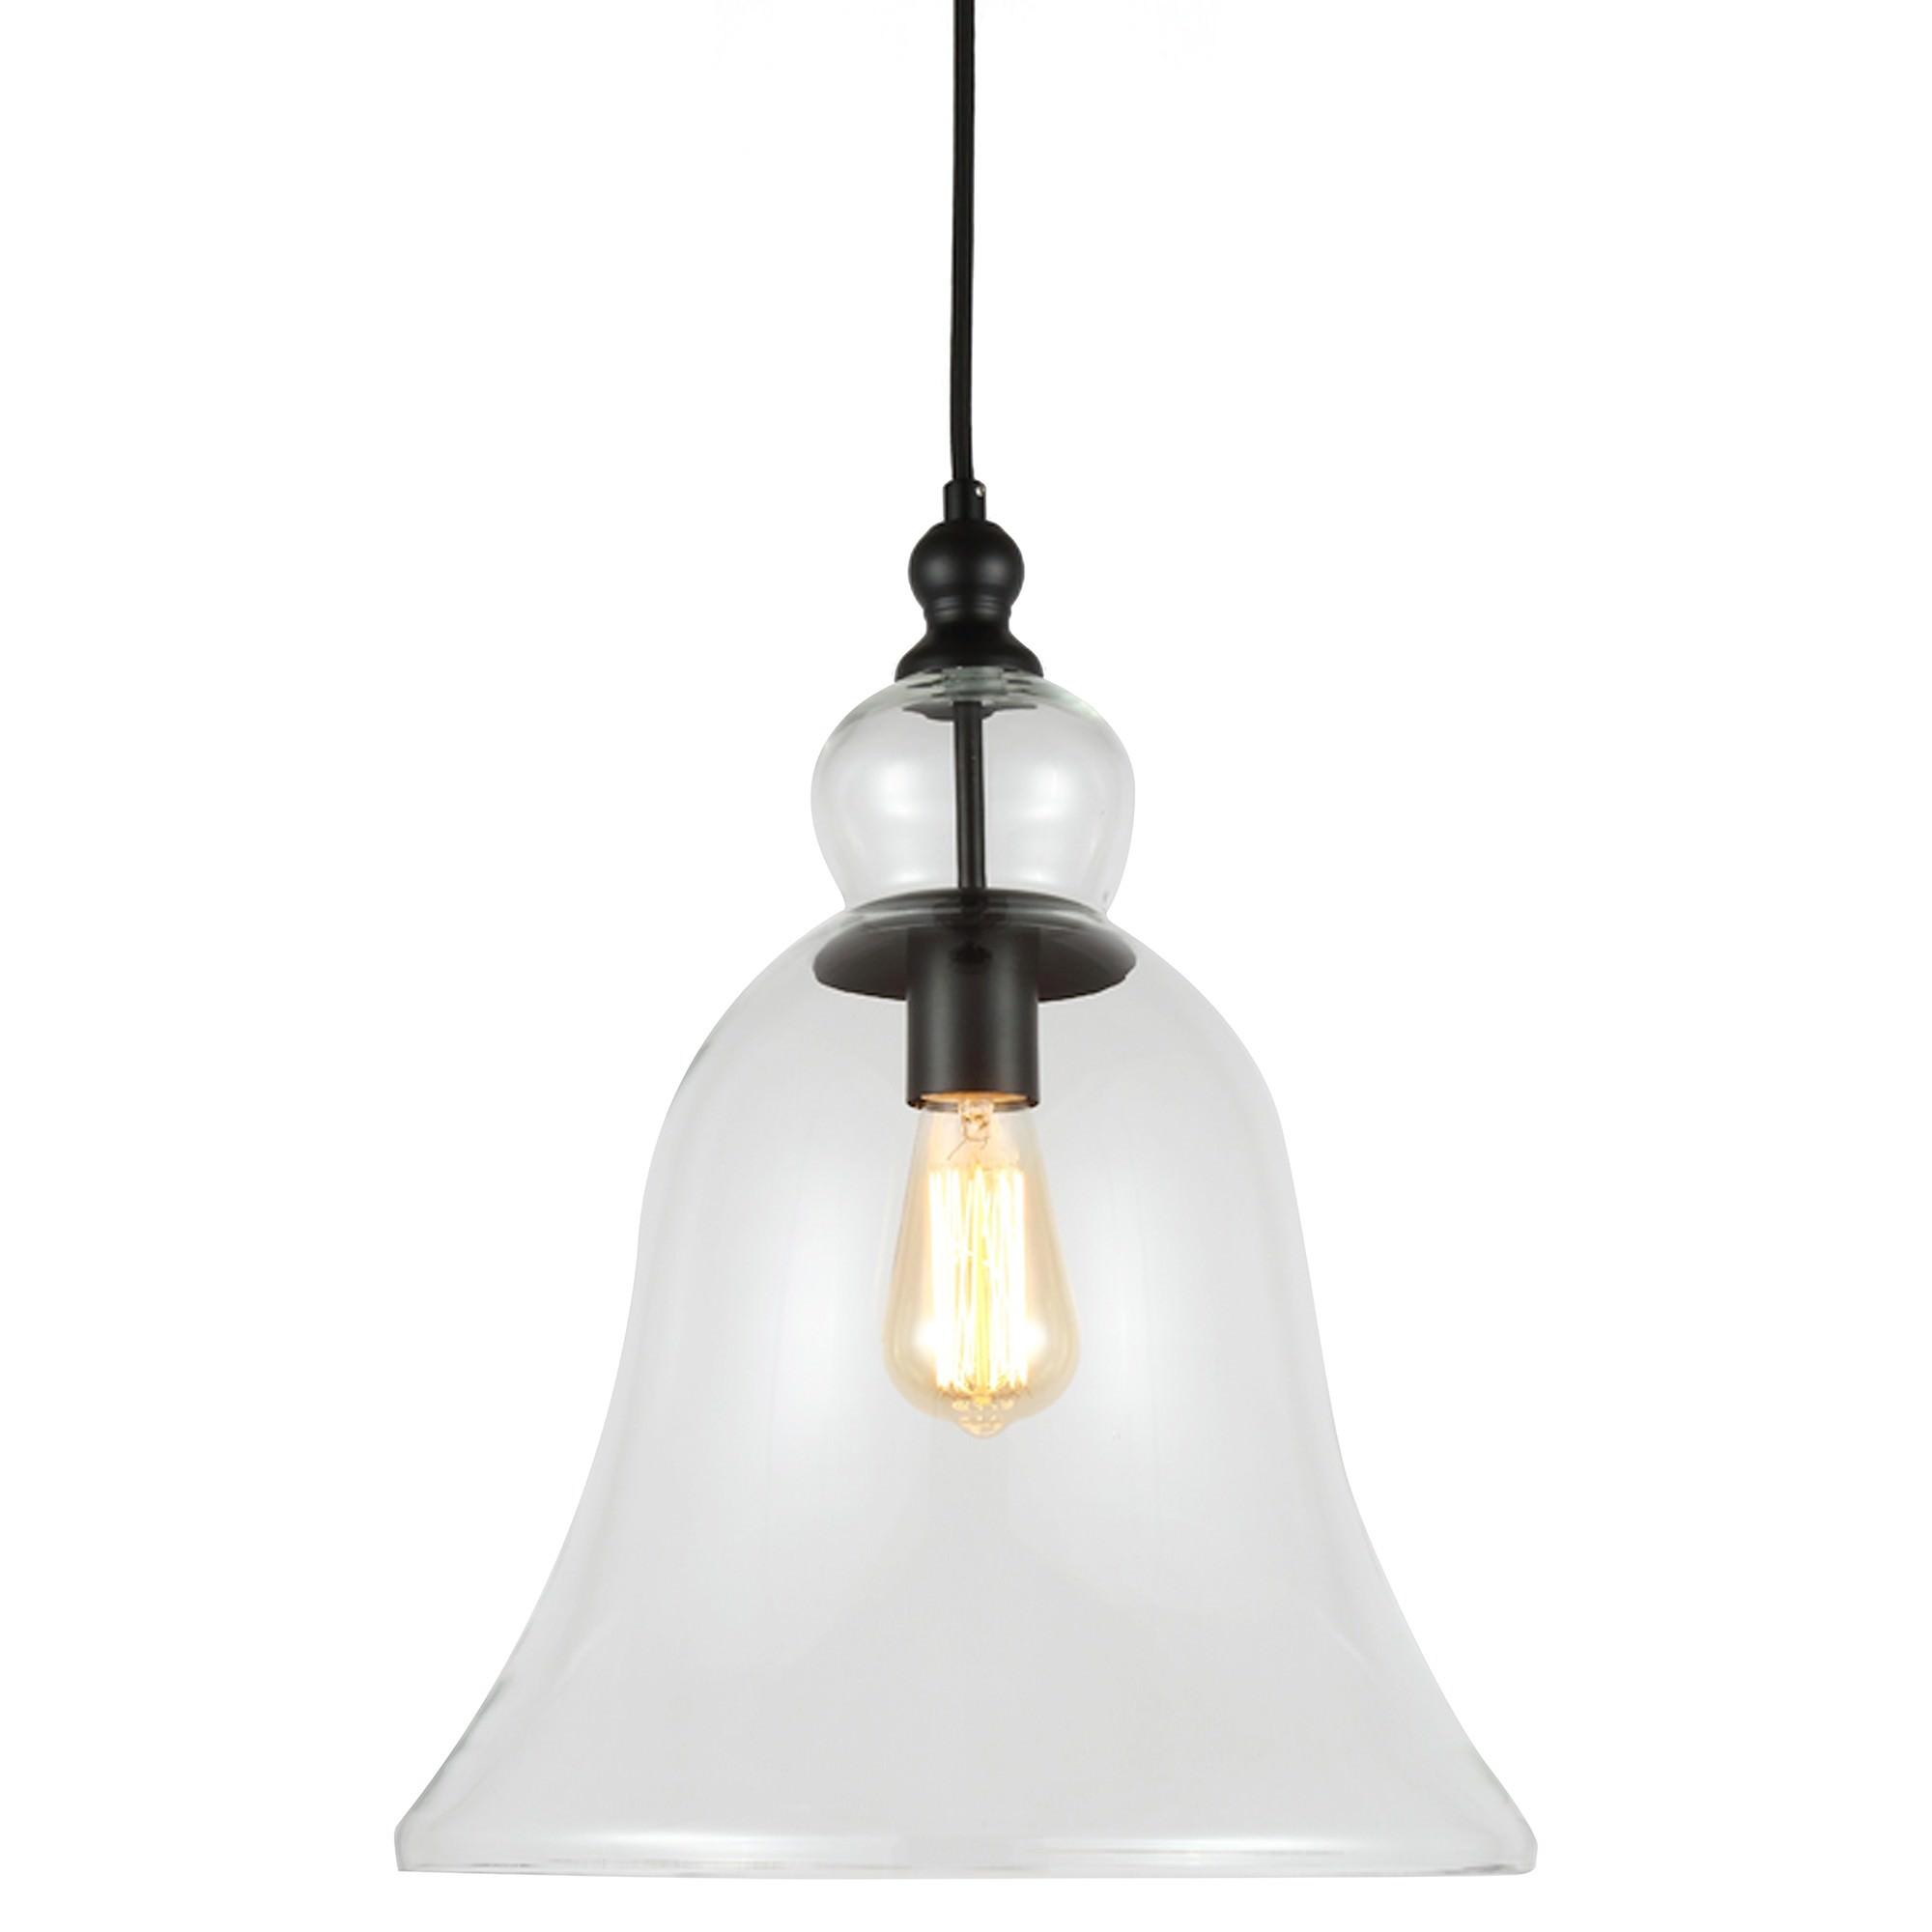 Berta Glass Bell Shade Pendant Light, Large